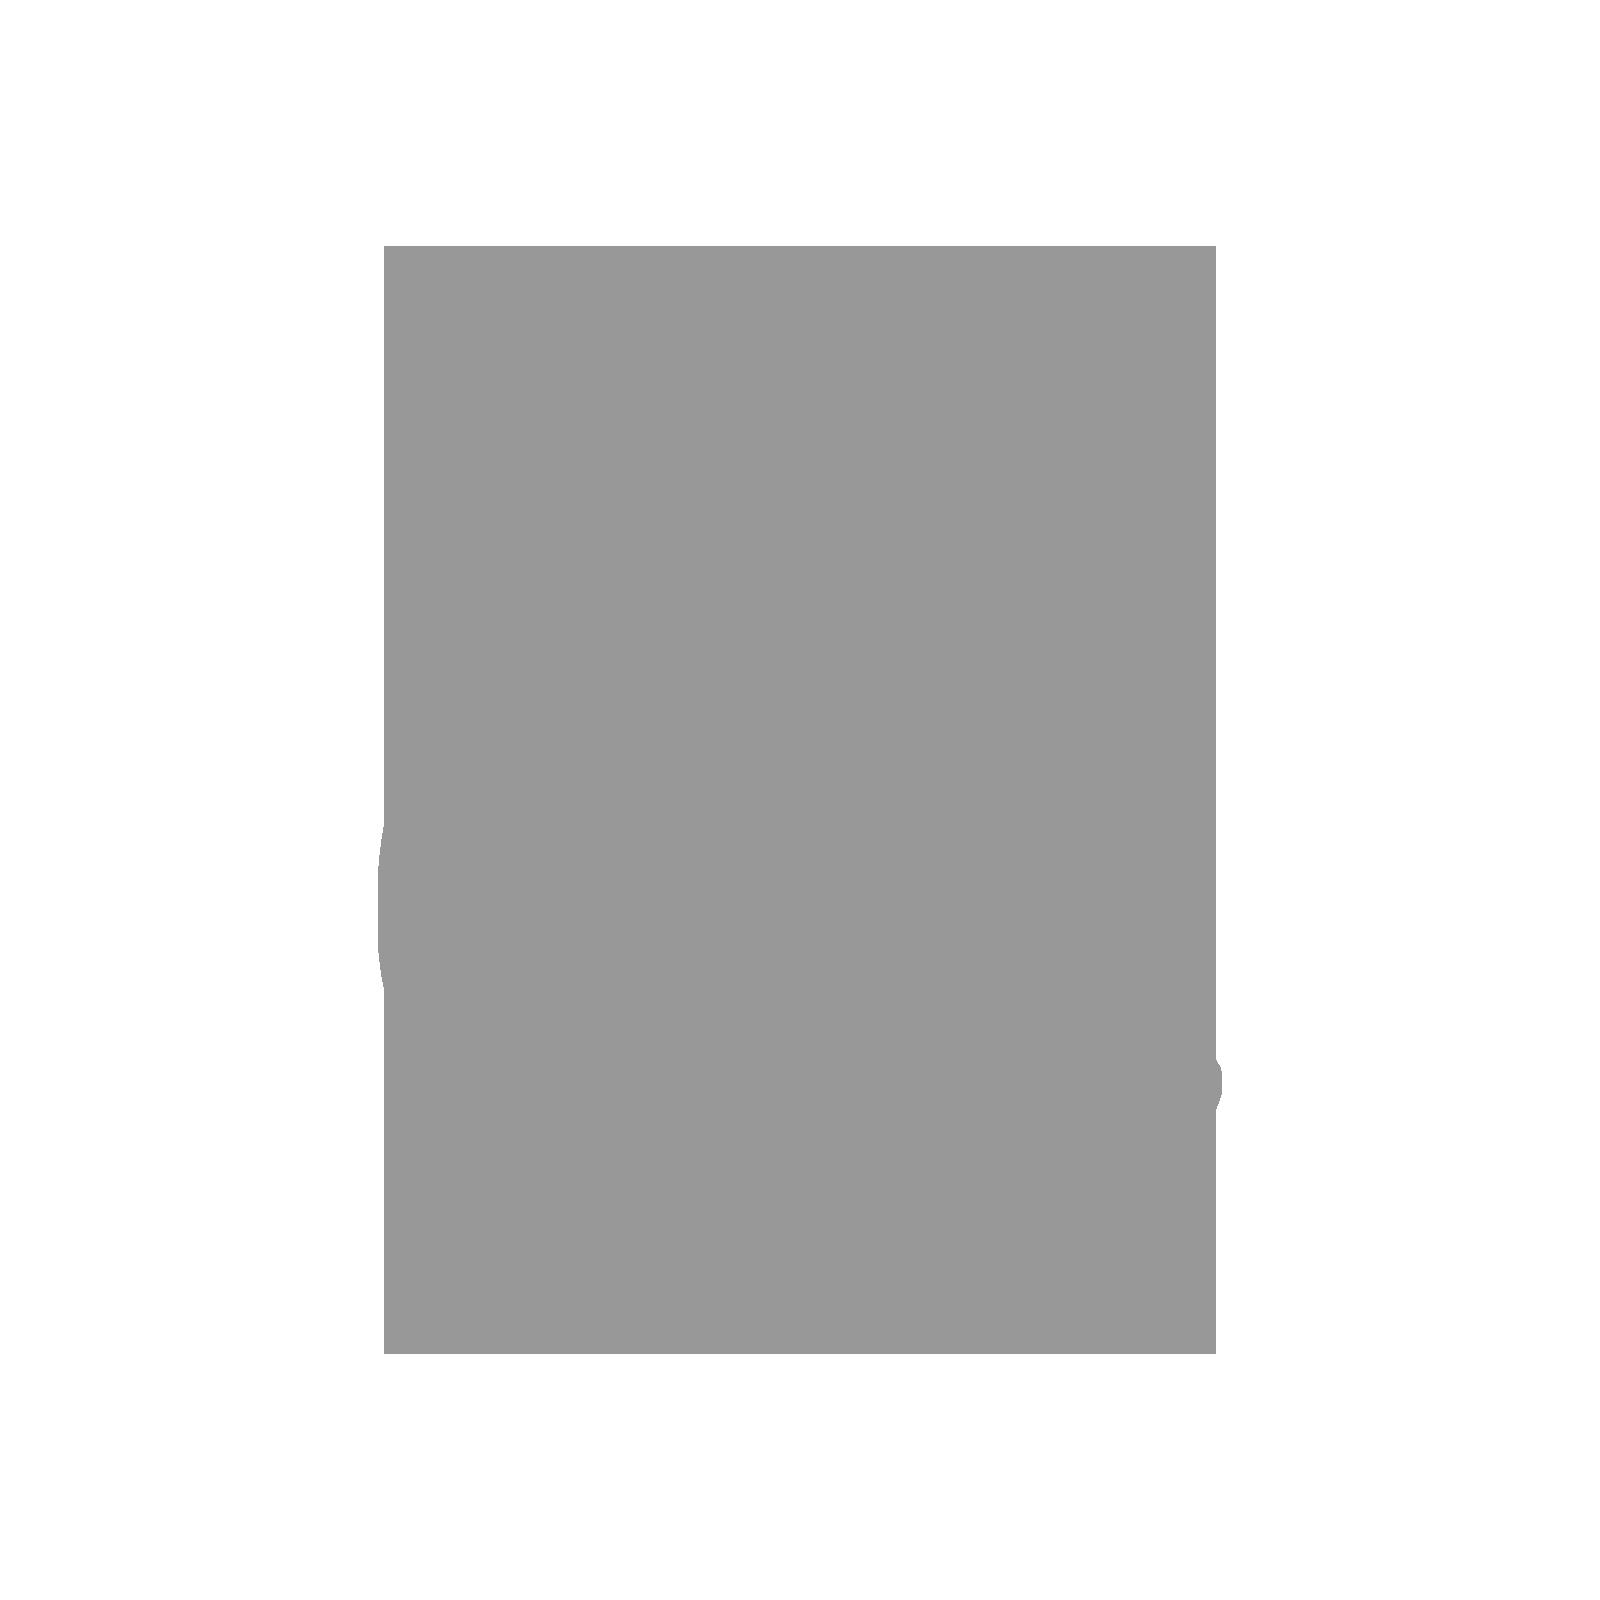 https://maukamakai.madebyscott.com/wp-content/uploads/2018/09/yelp-logo.png